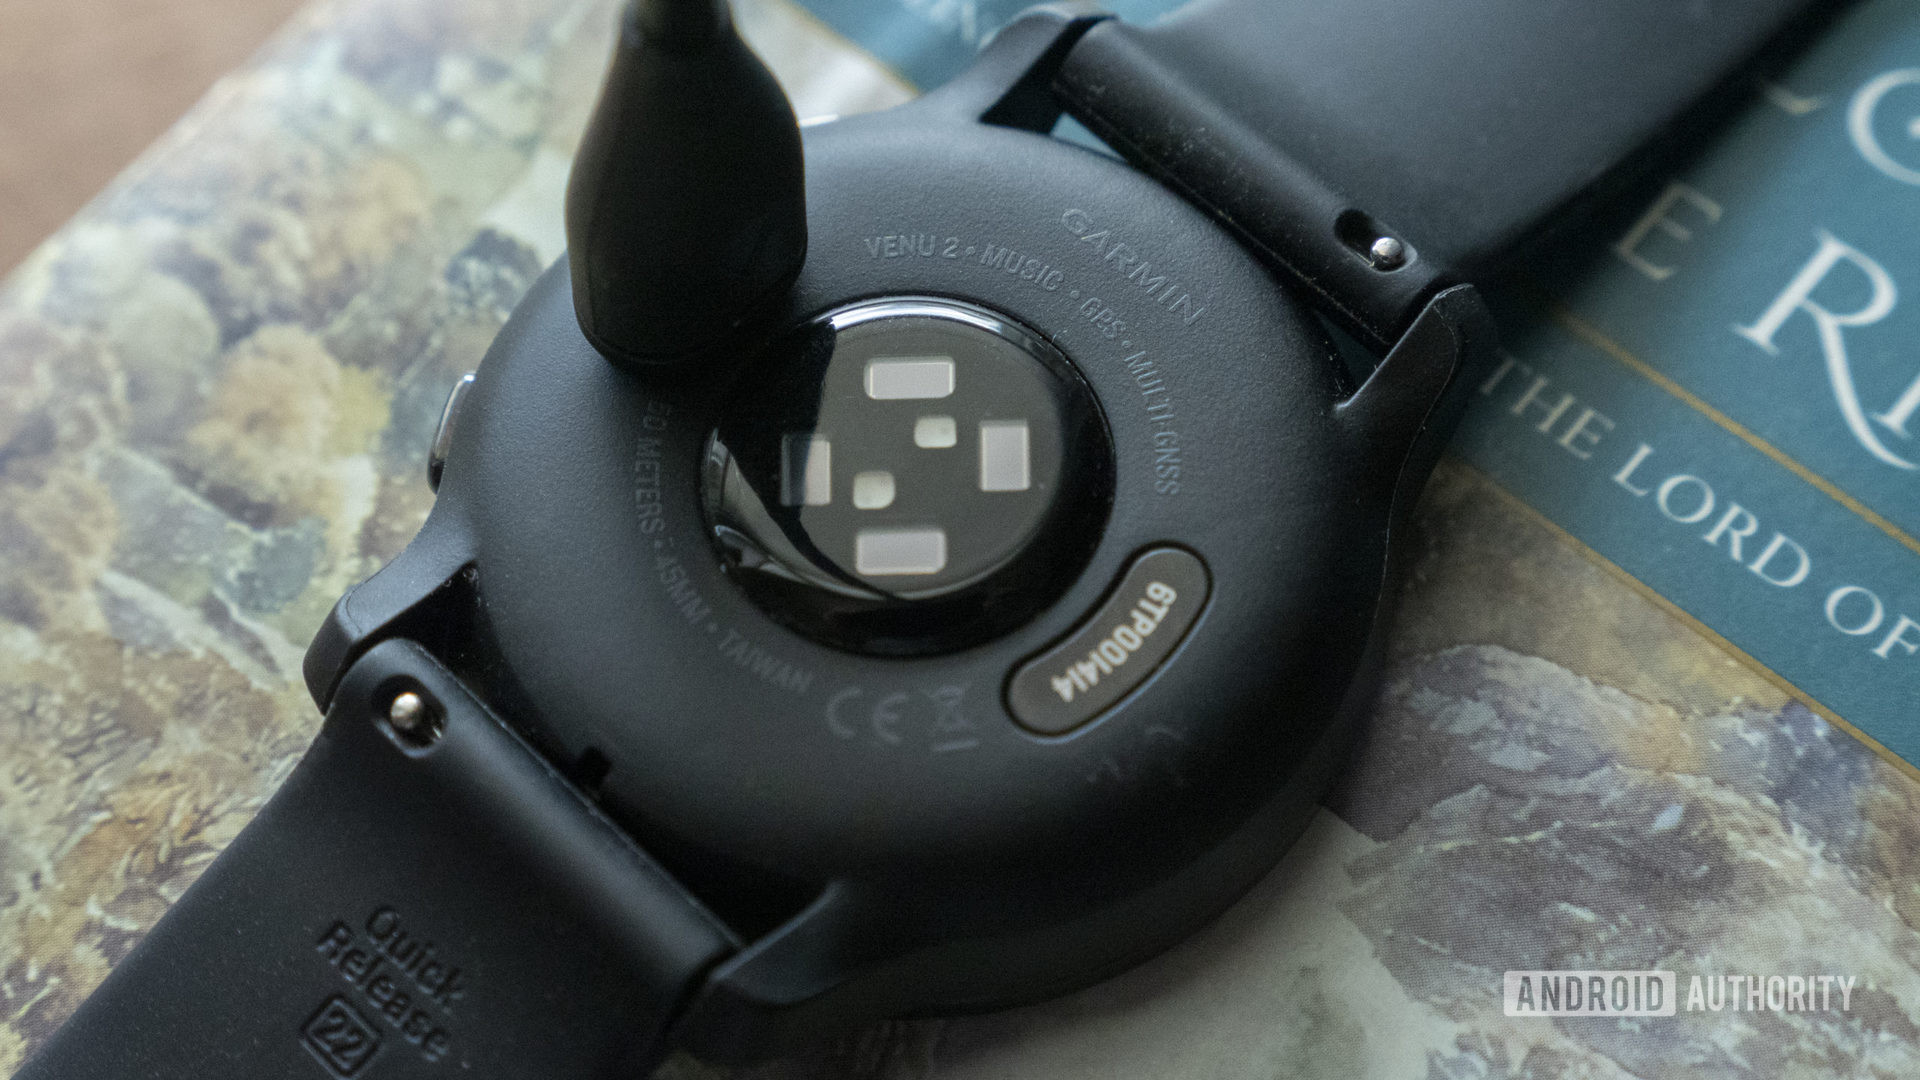 garmin venu 2 review charging cable battery life